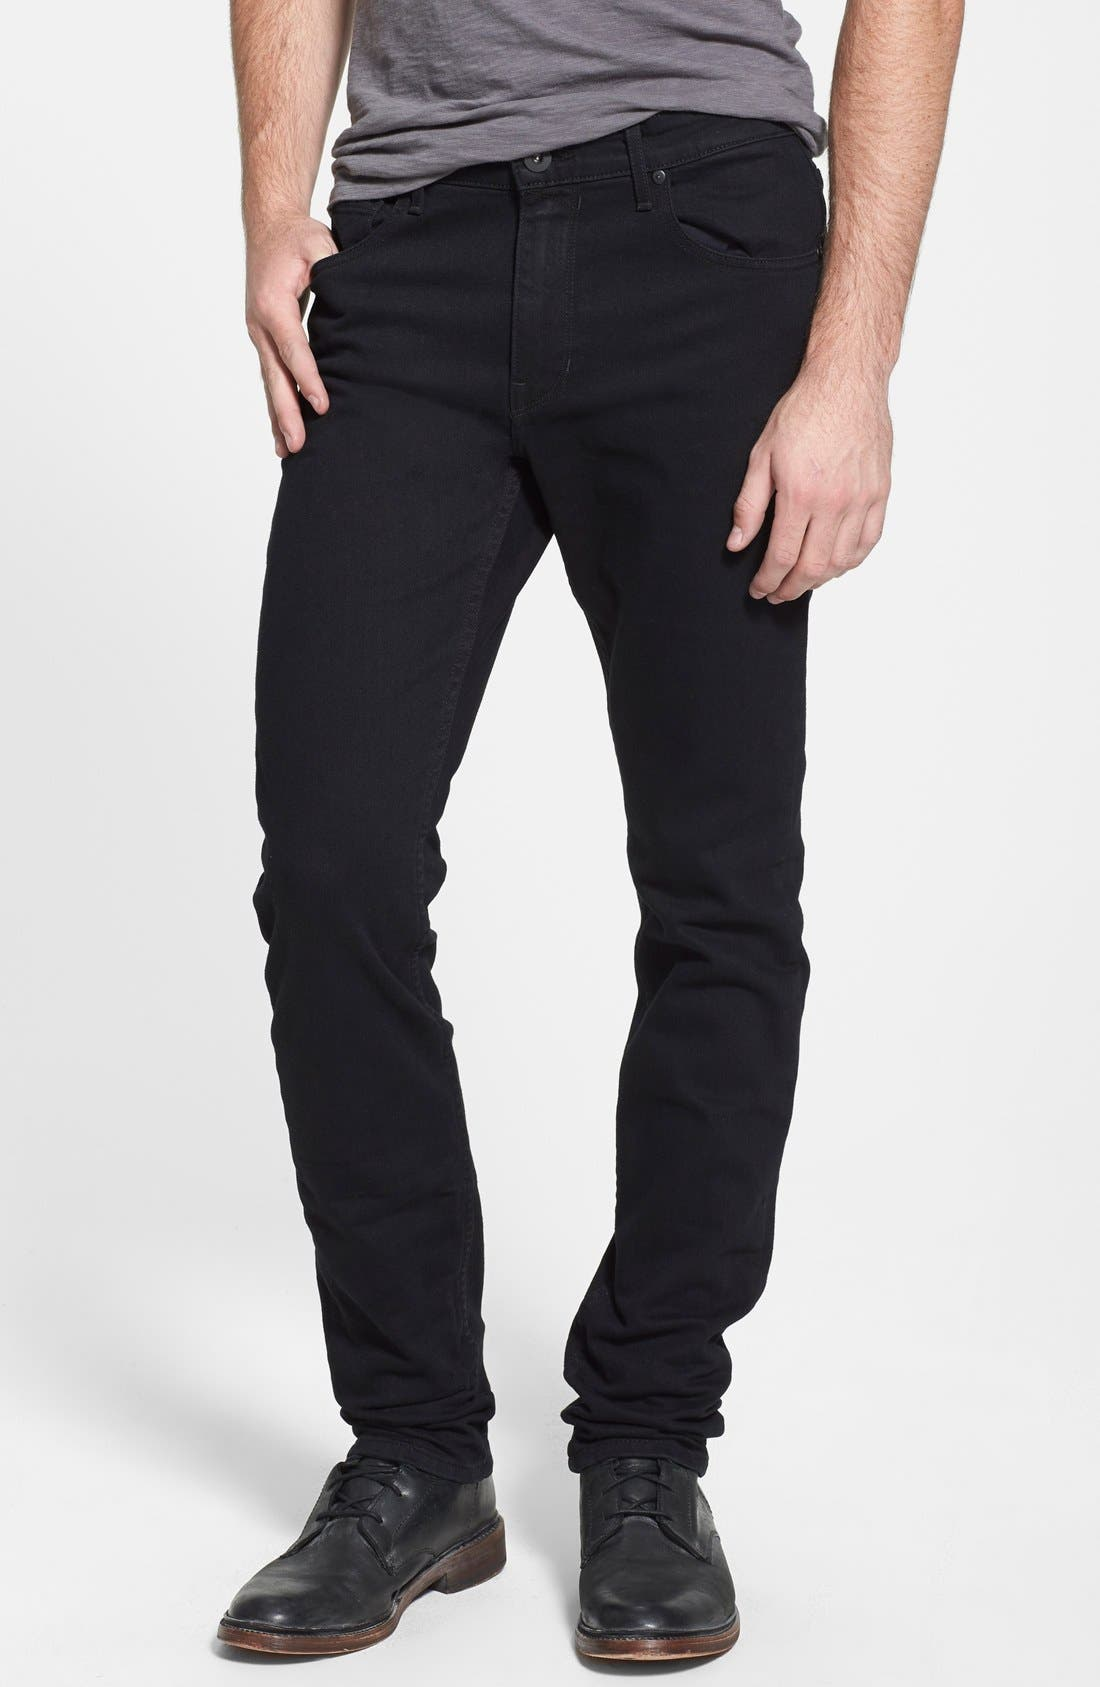 PAIGE Lennox Slim Fit Jeans (Black Overdye) | Nordstrom